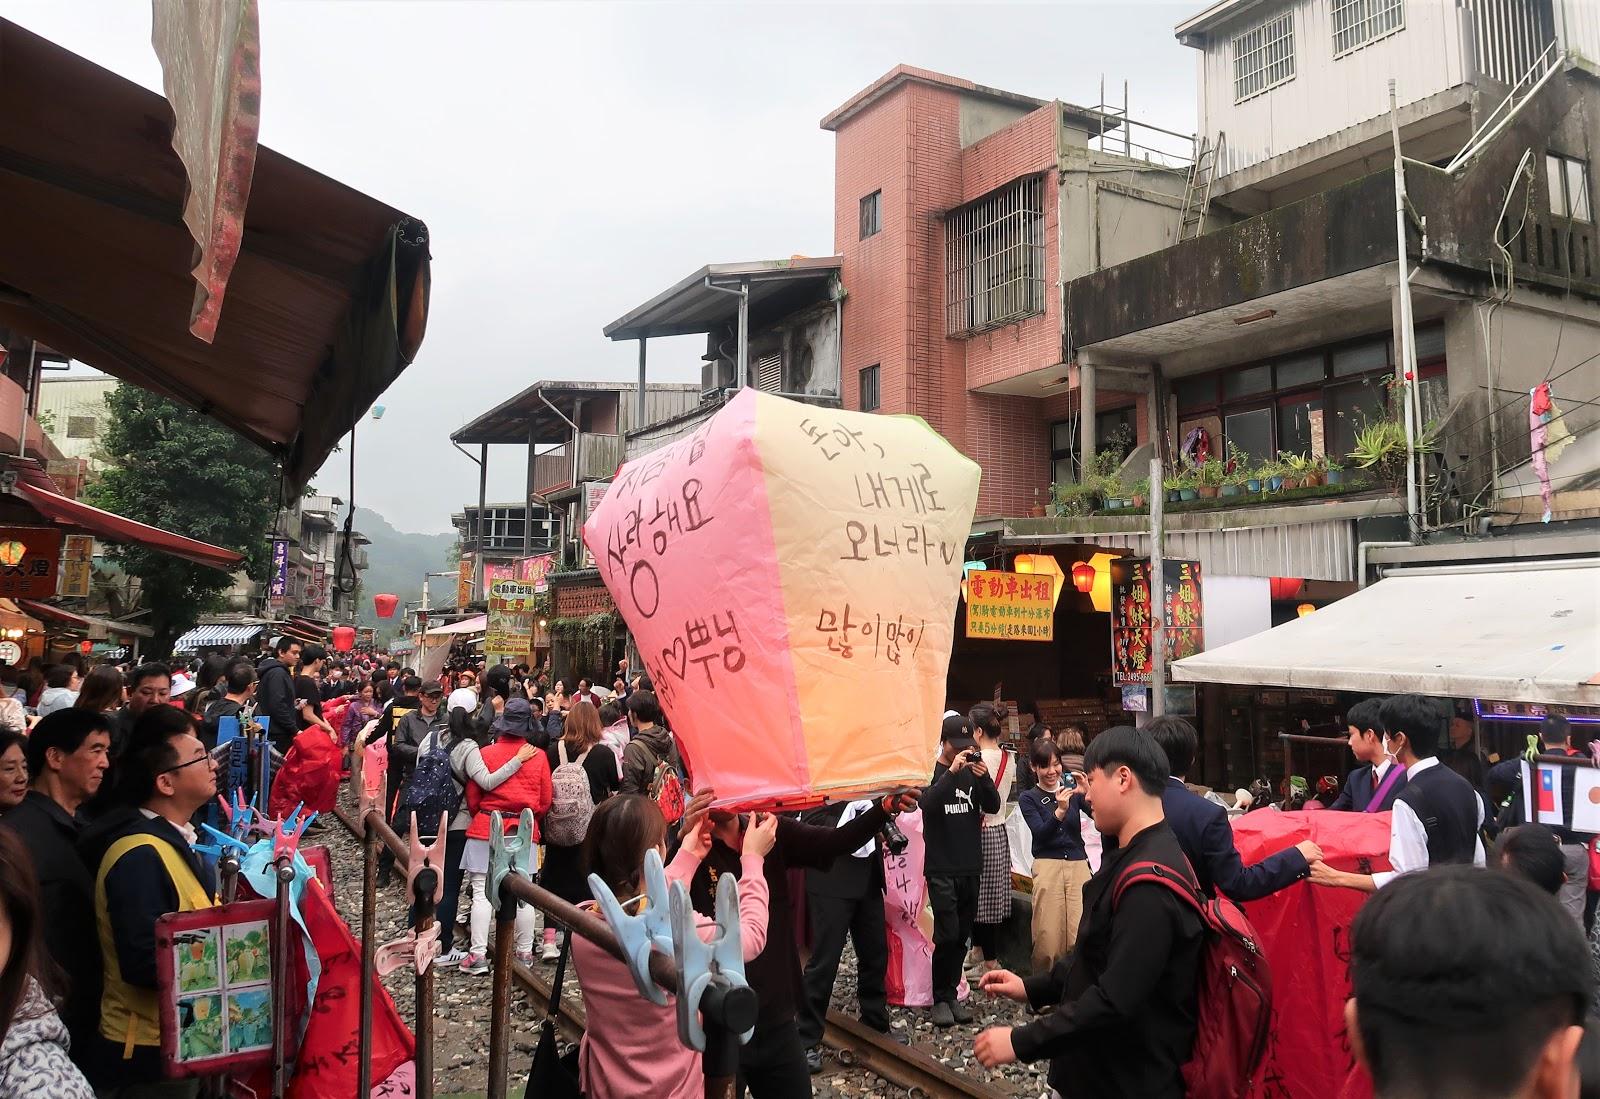 Sky Lantern in Shifen